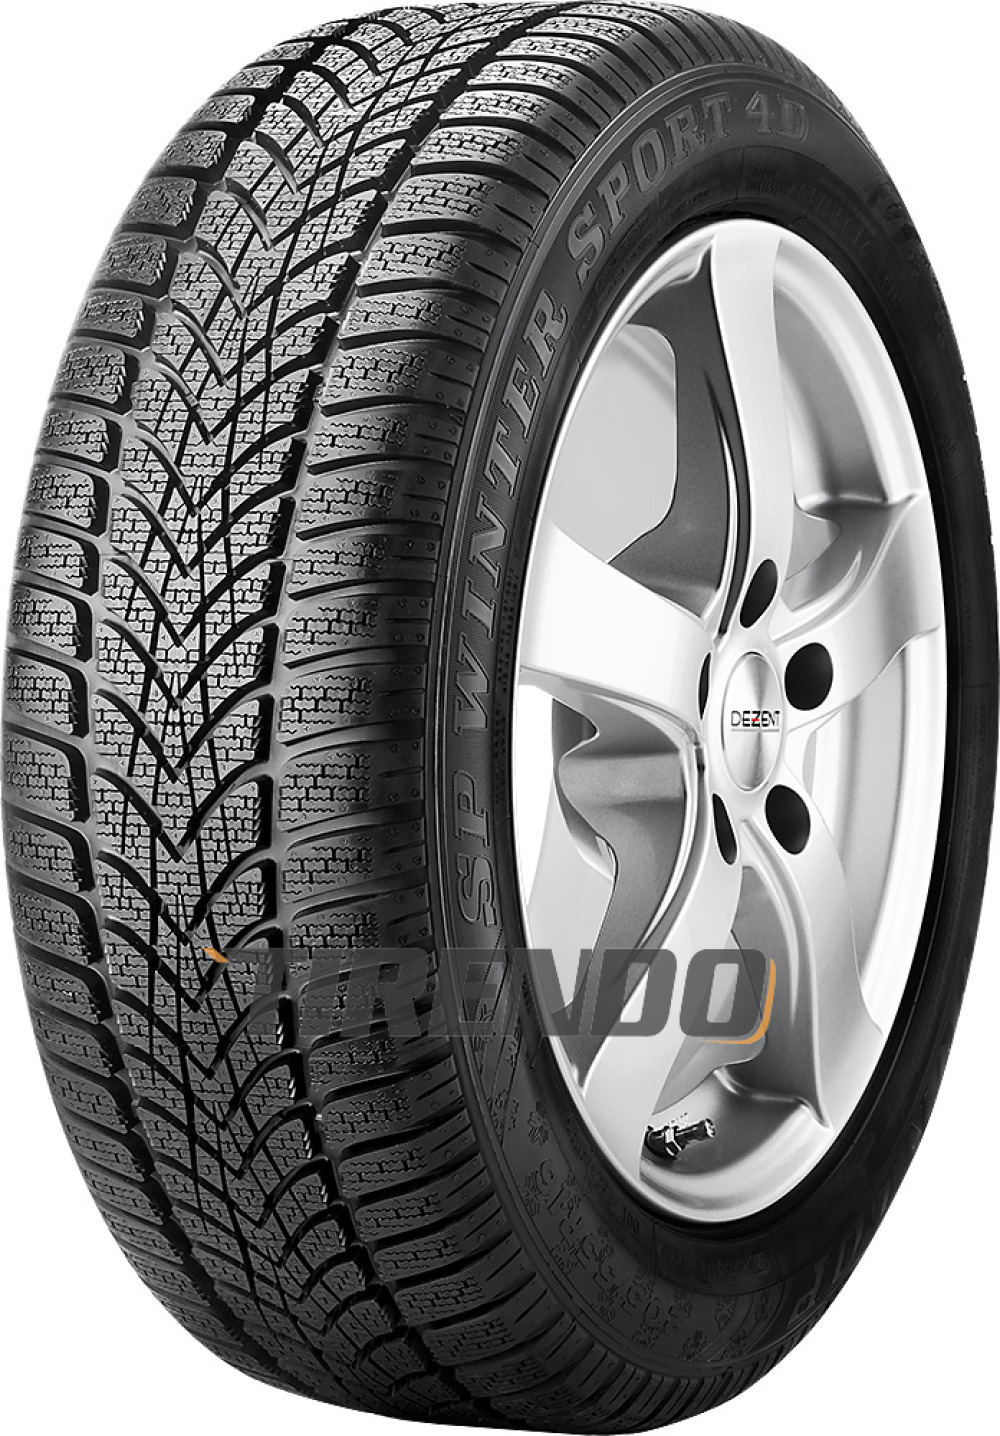 Dunlop SP Winter Sport 4D ( 255/50 R19 103V , mit Felgenschutz (MFS), N0 BLT )